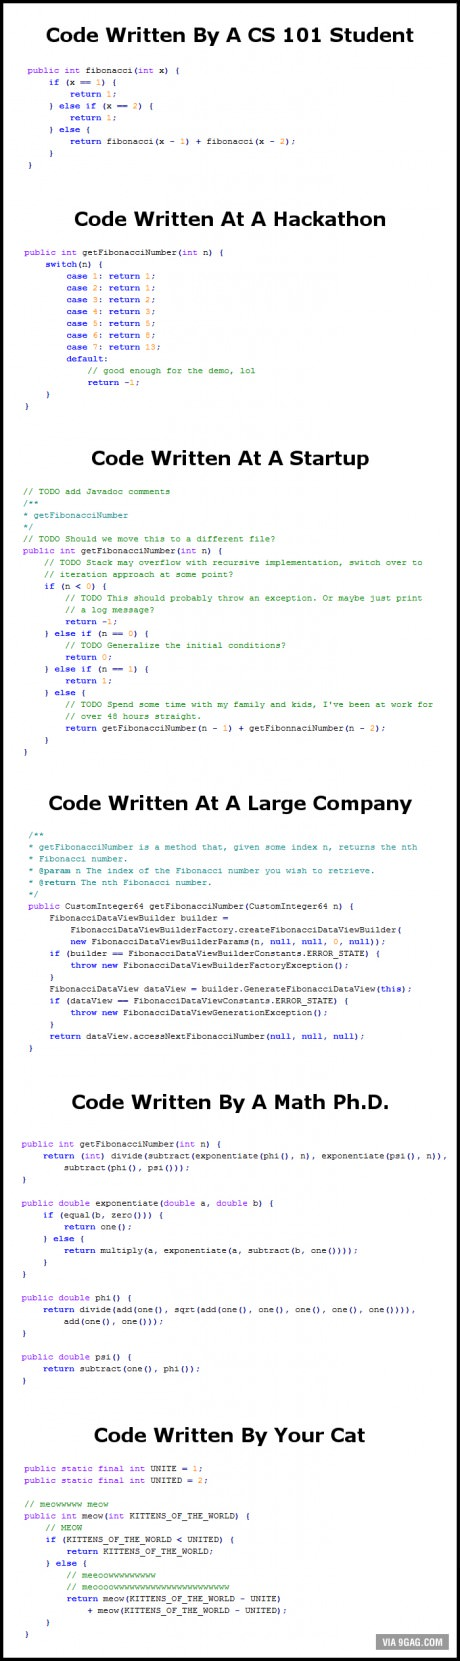 20131220_codewrittenby